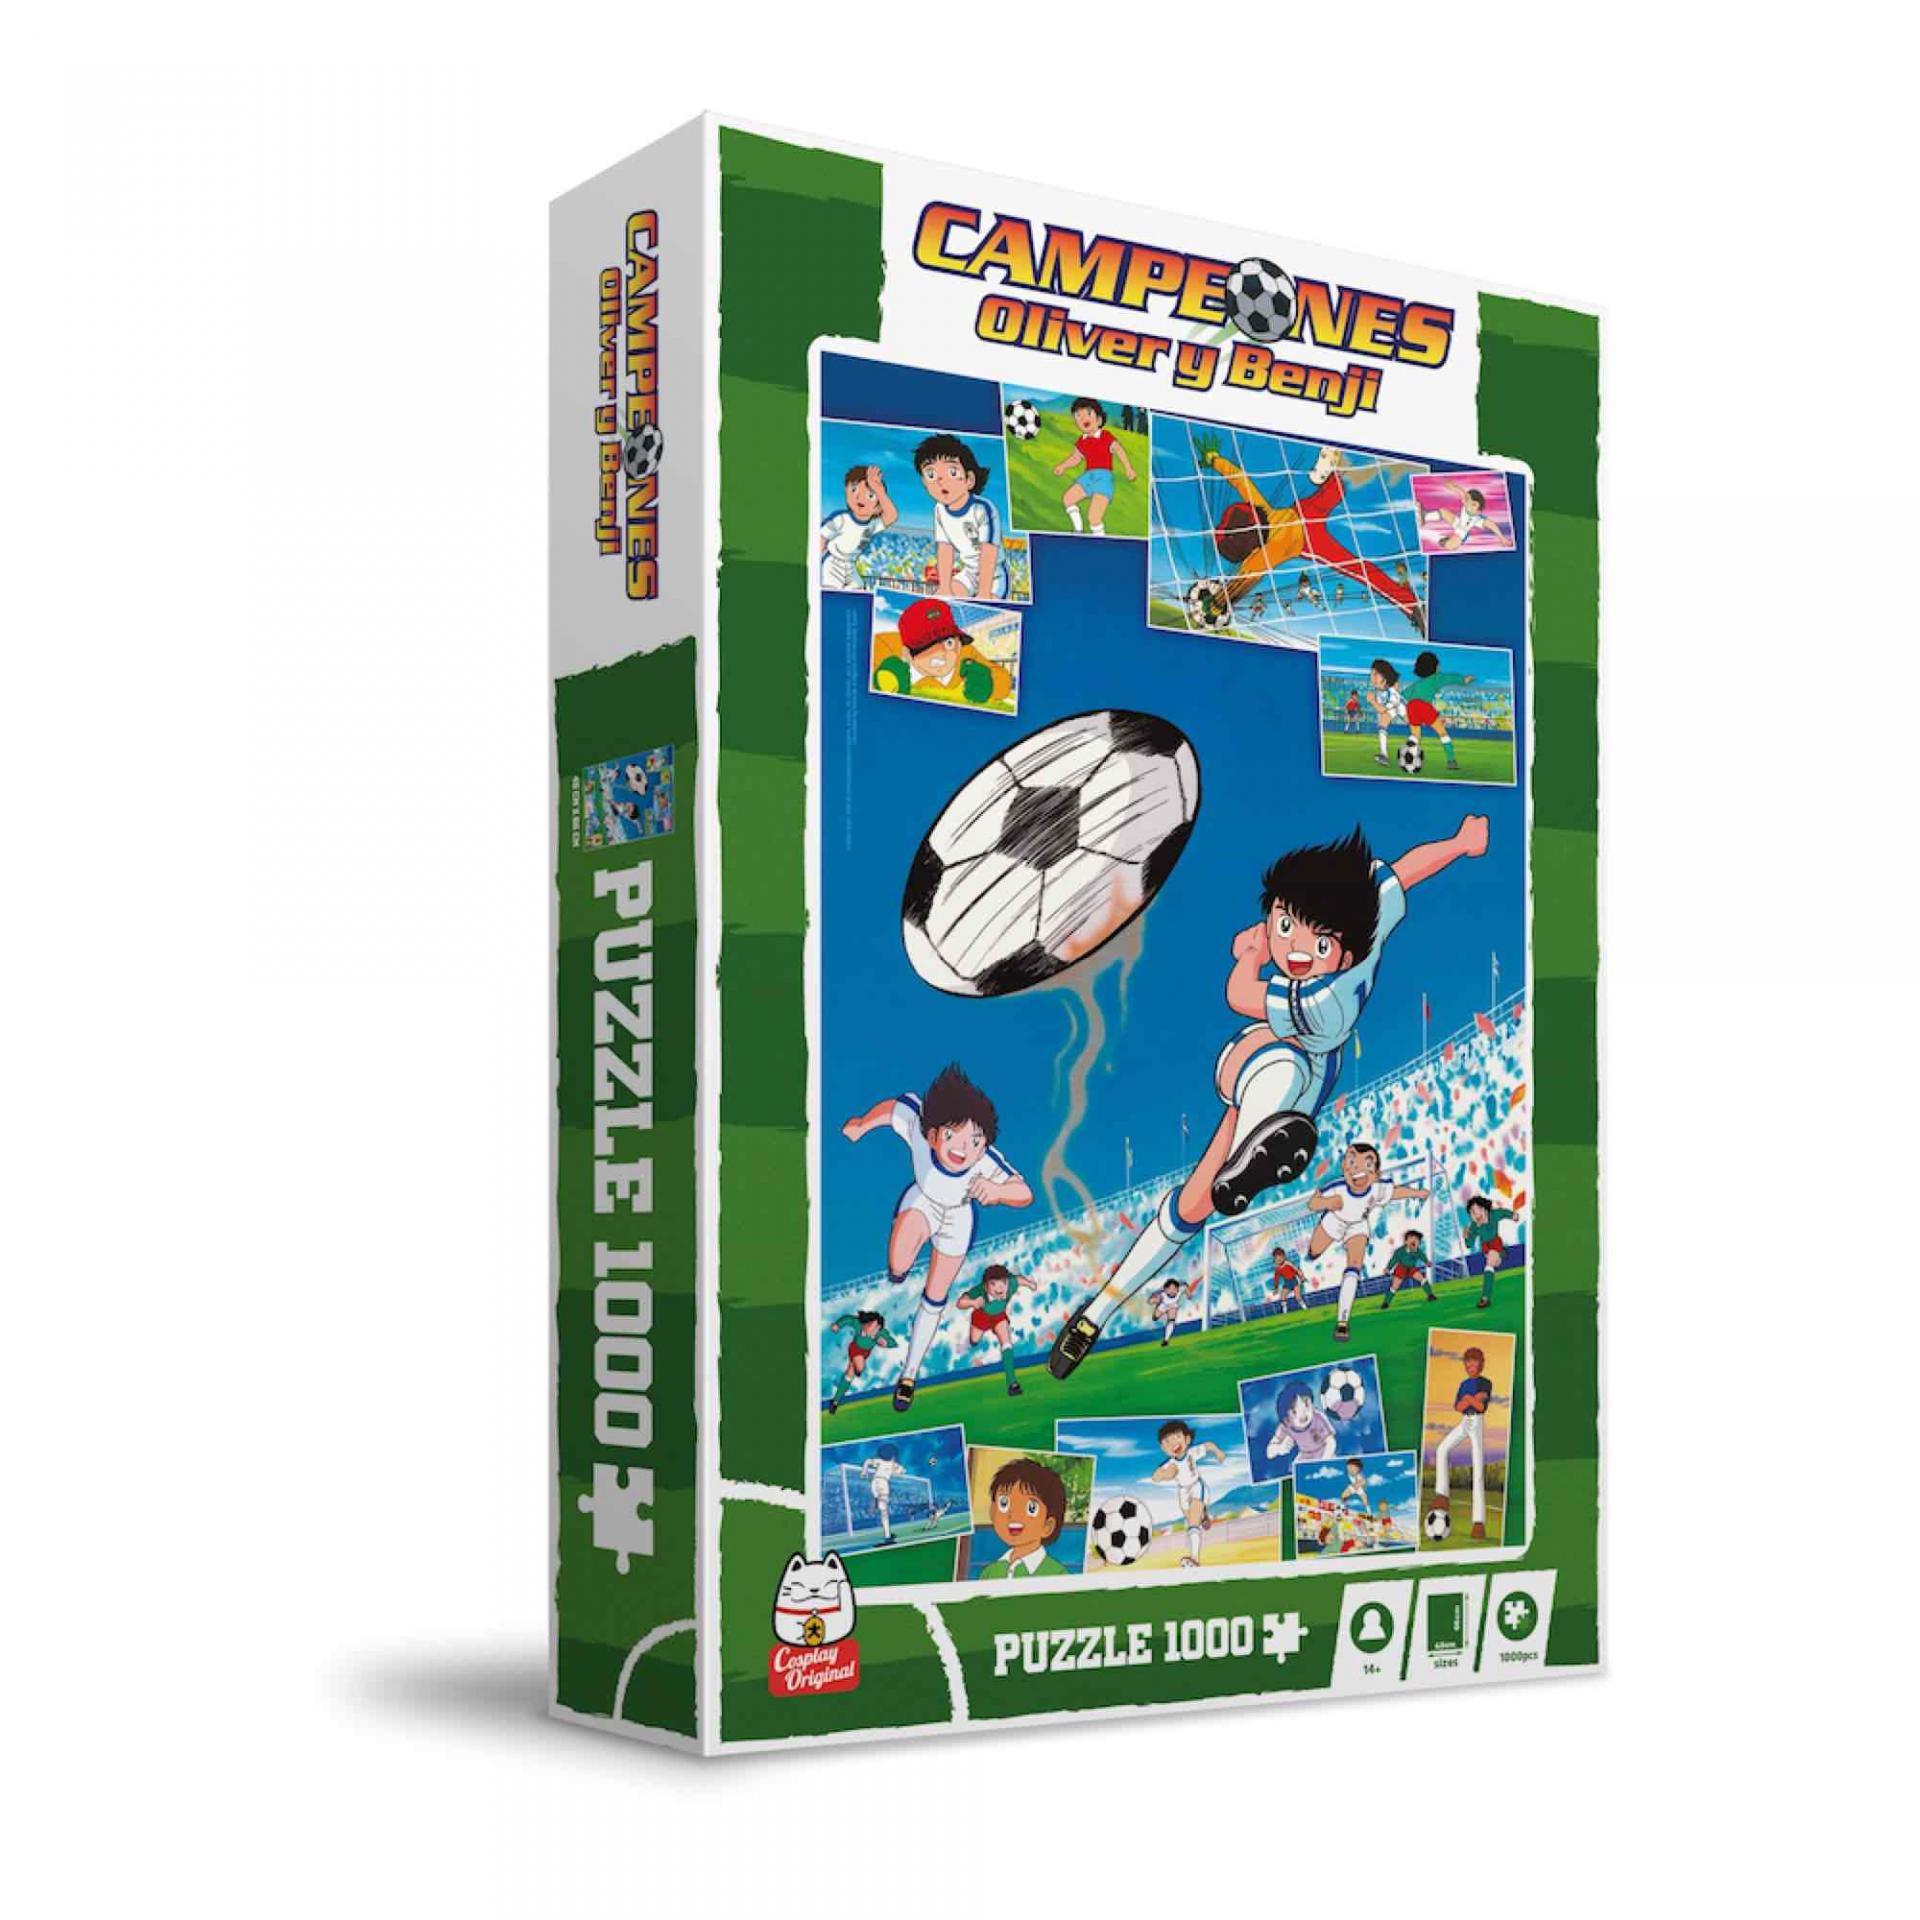 Captain tsubasa puzzle shooting suukoo toys 2